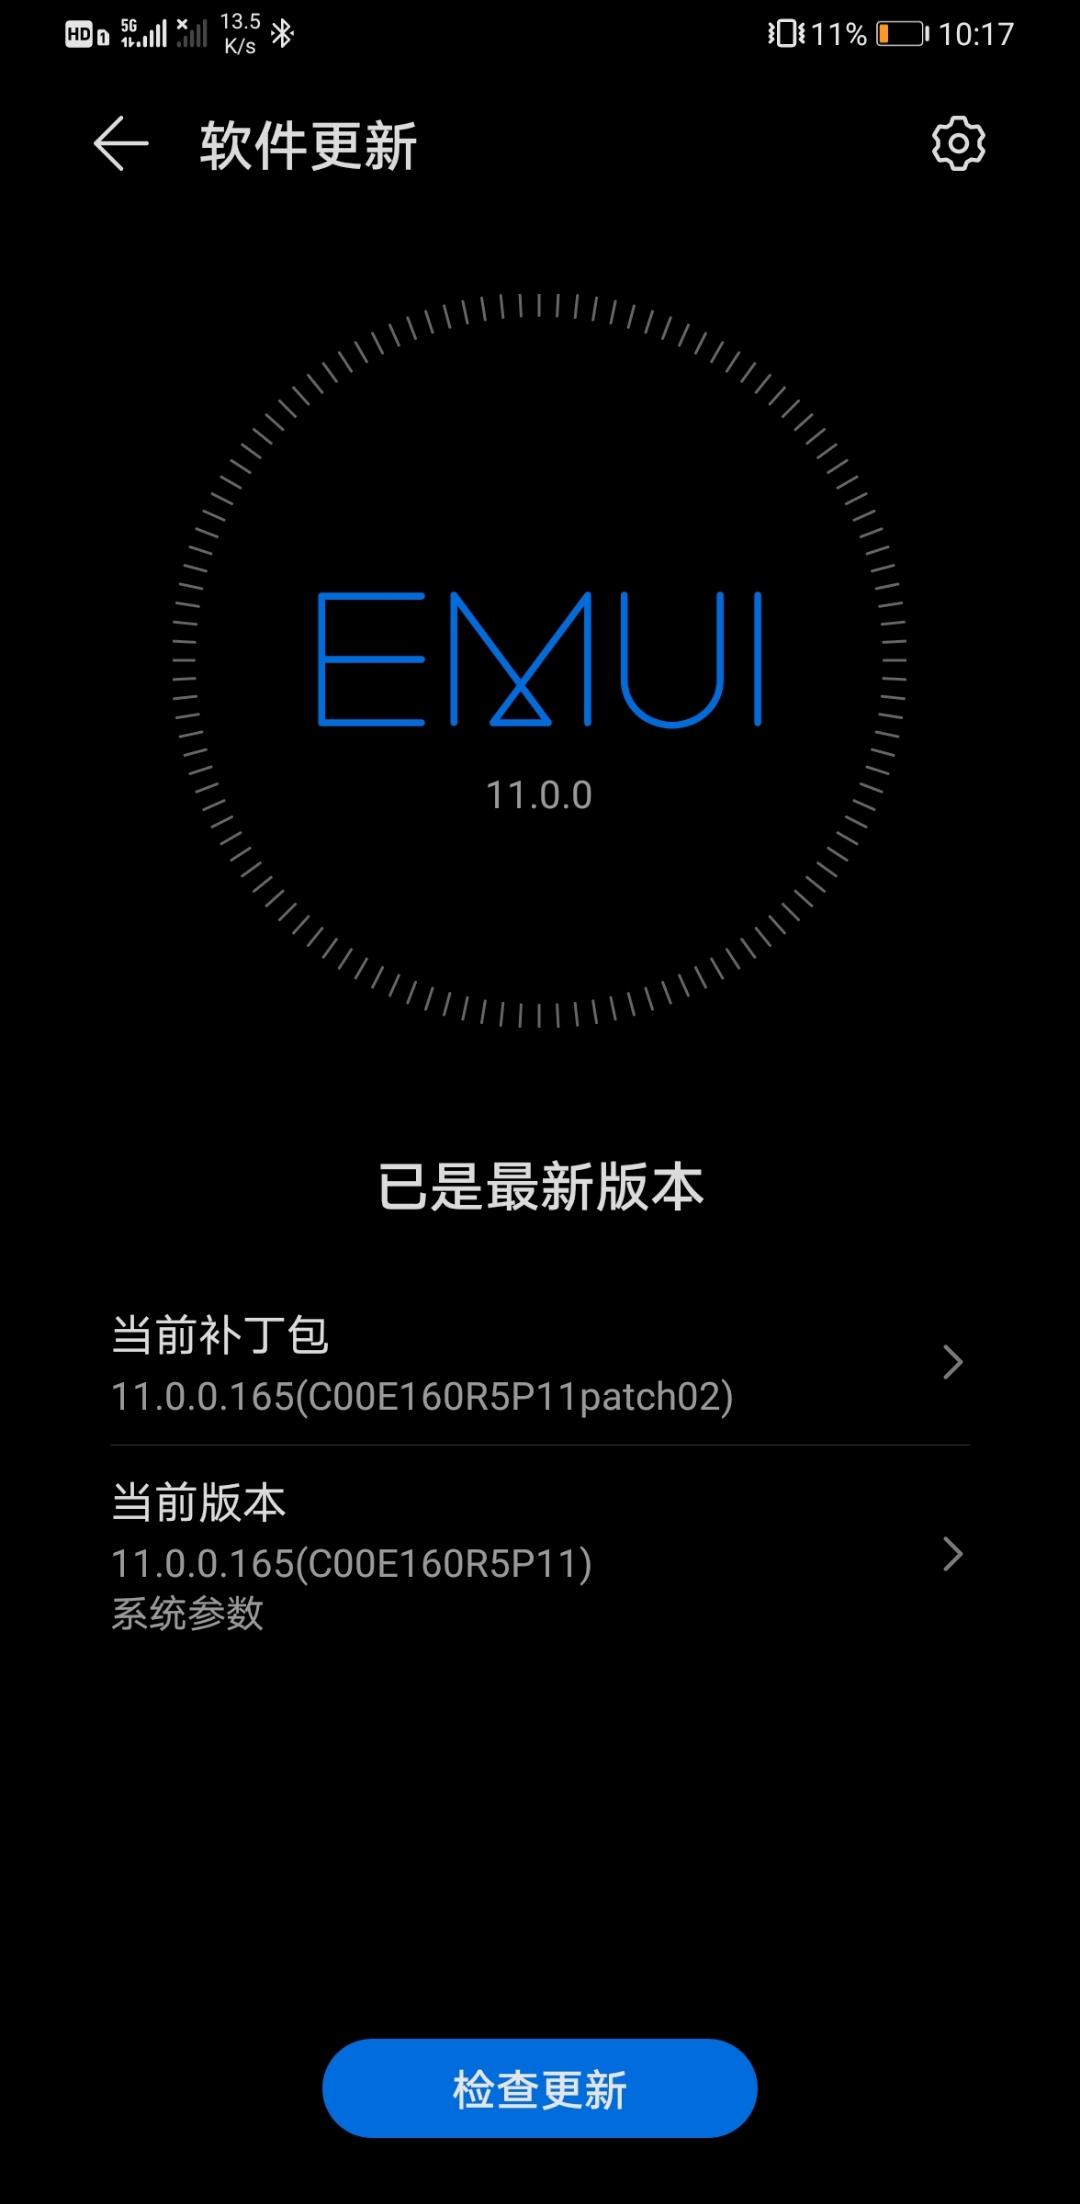 Screenshot_20210603_101702_com.huawei.android.hwouc.jpg